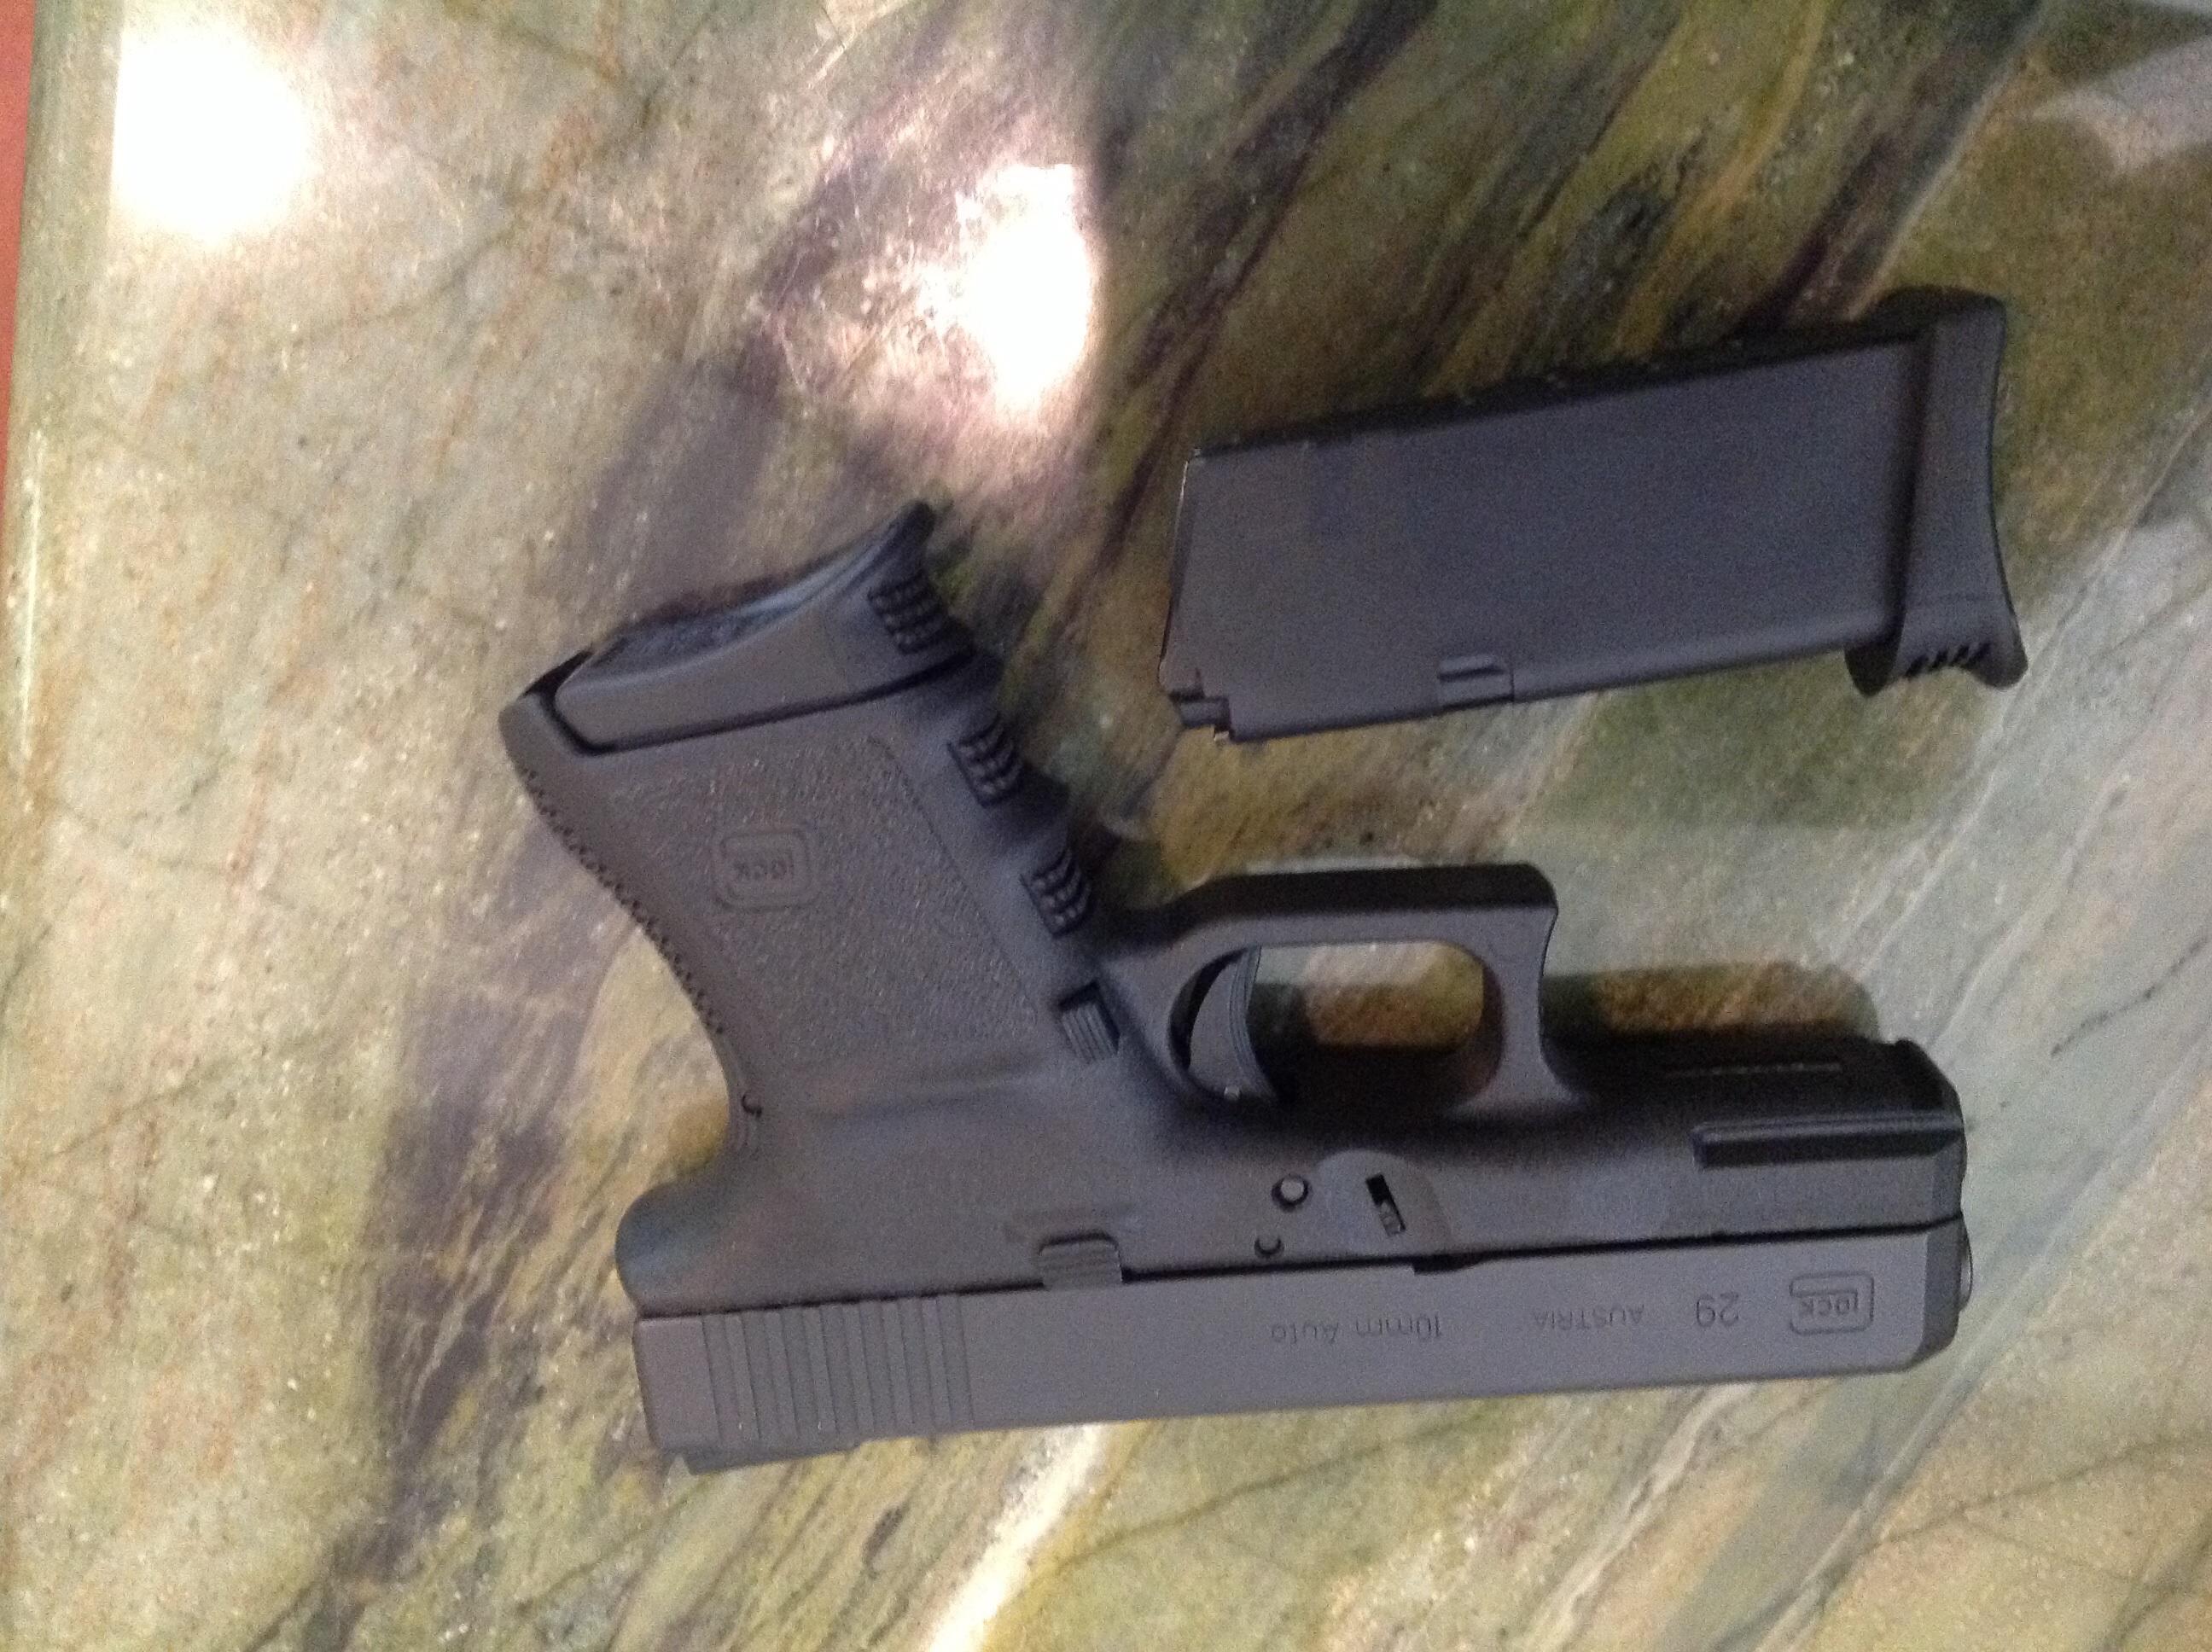 New Glock 29 SF 10mm owner report.-image.jpg